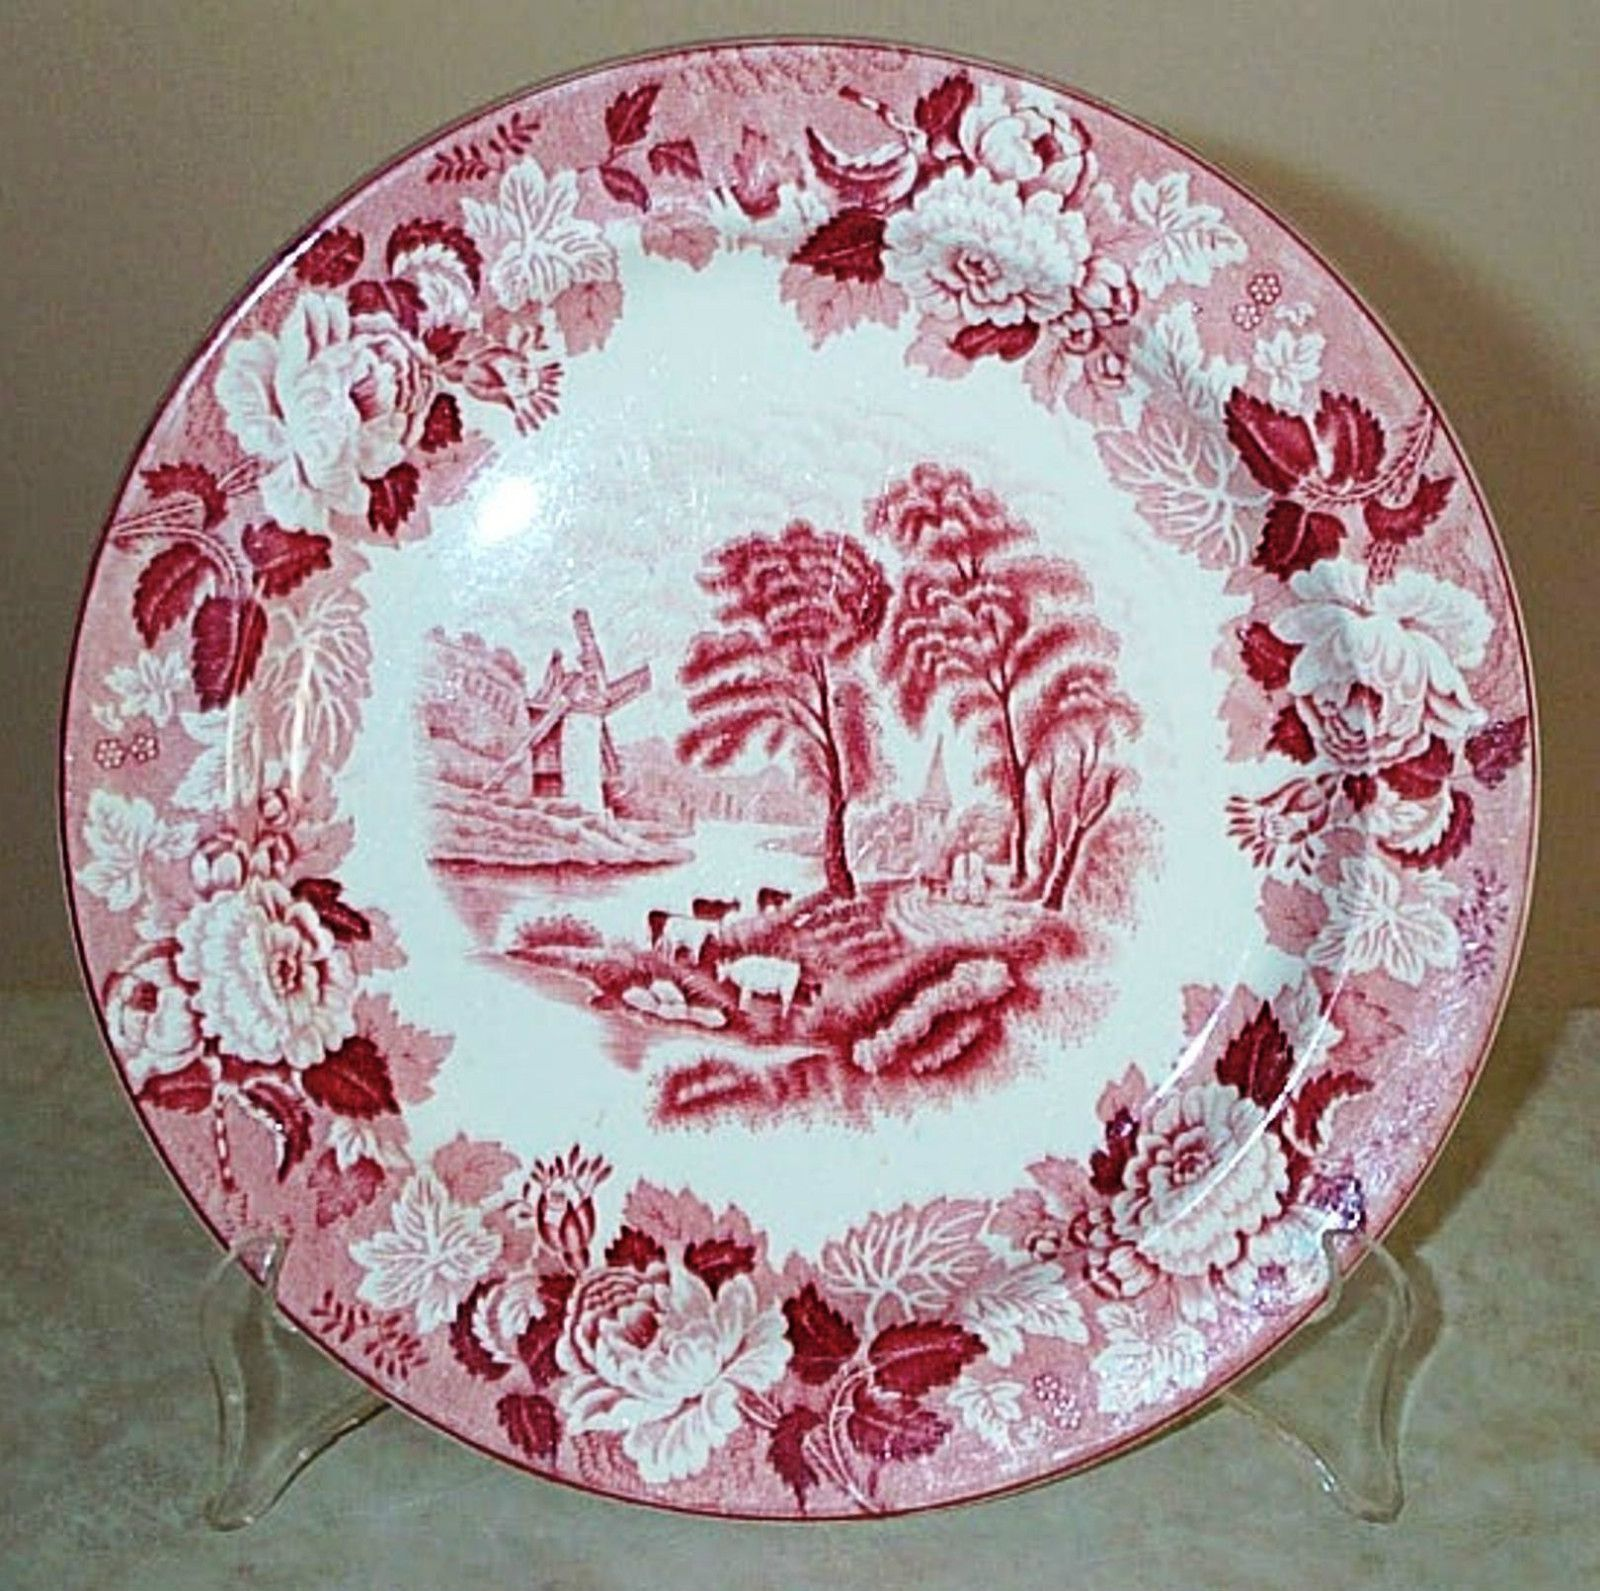 "Enoch Woods English Scenery Plate 9 1 4"" ""Dinner Cows"" Red Transferware | eBay"